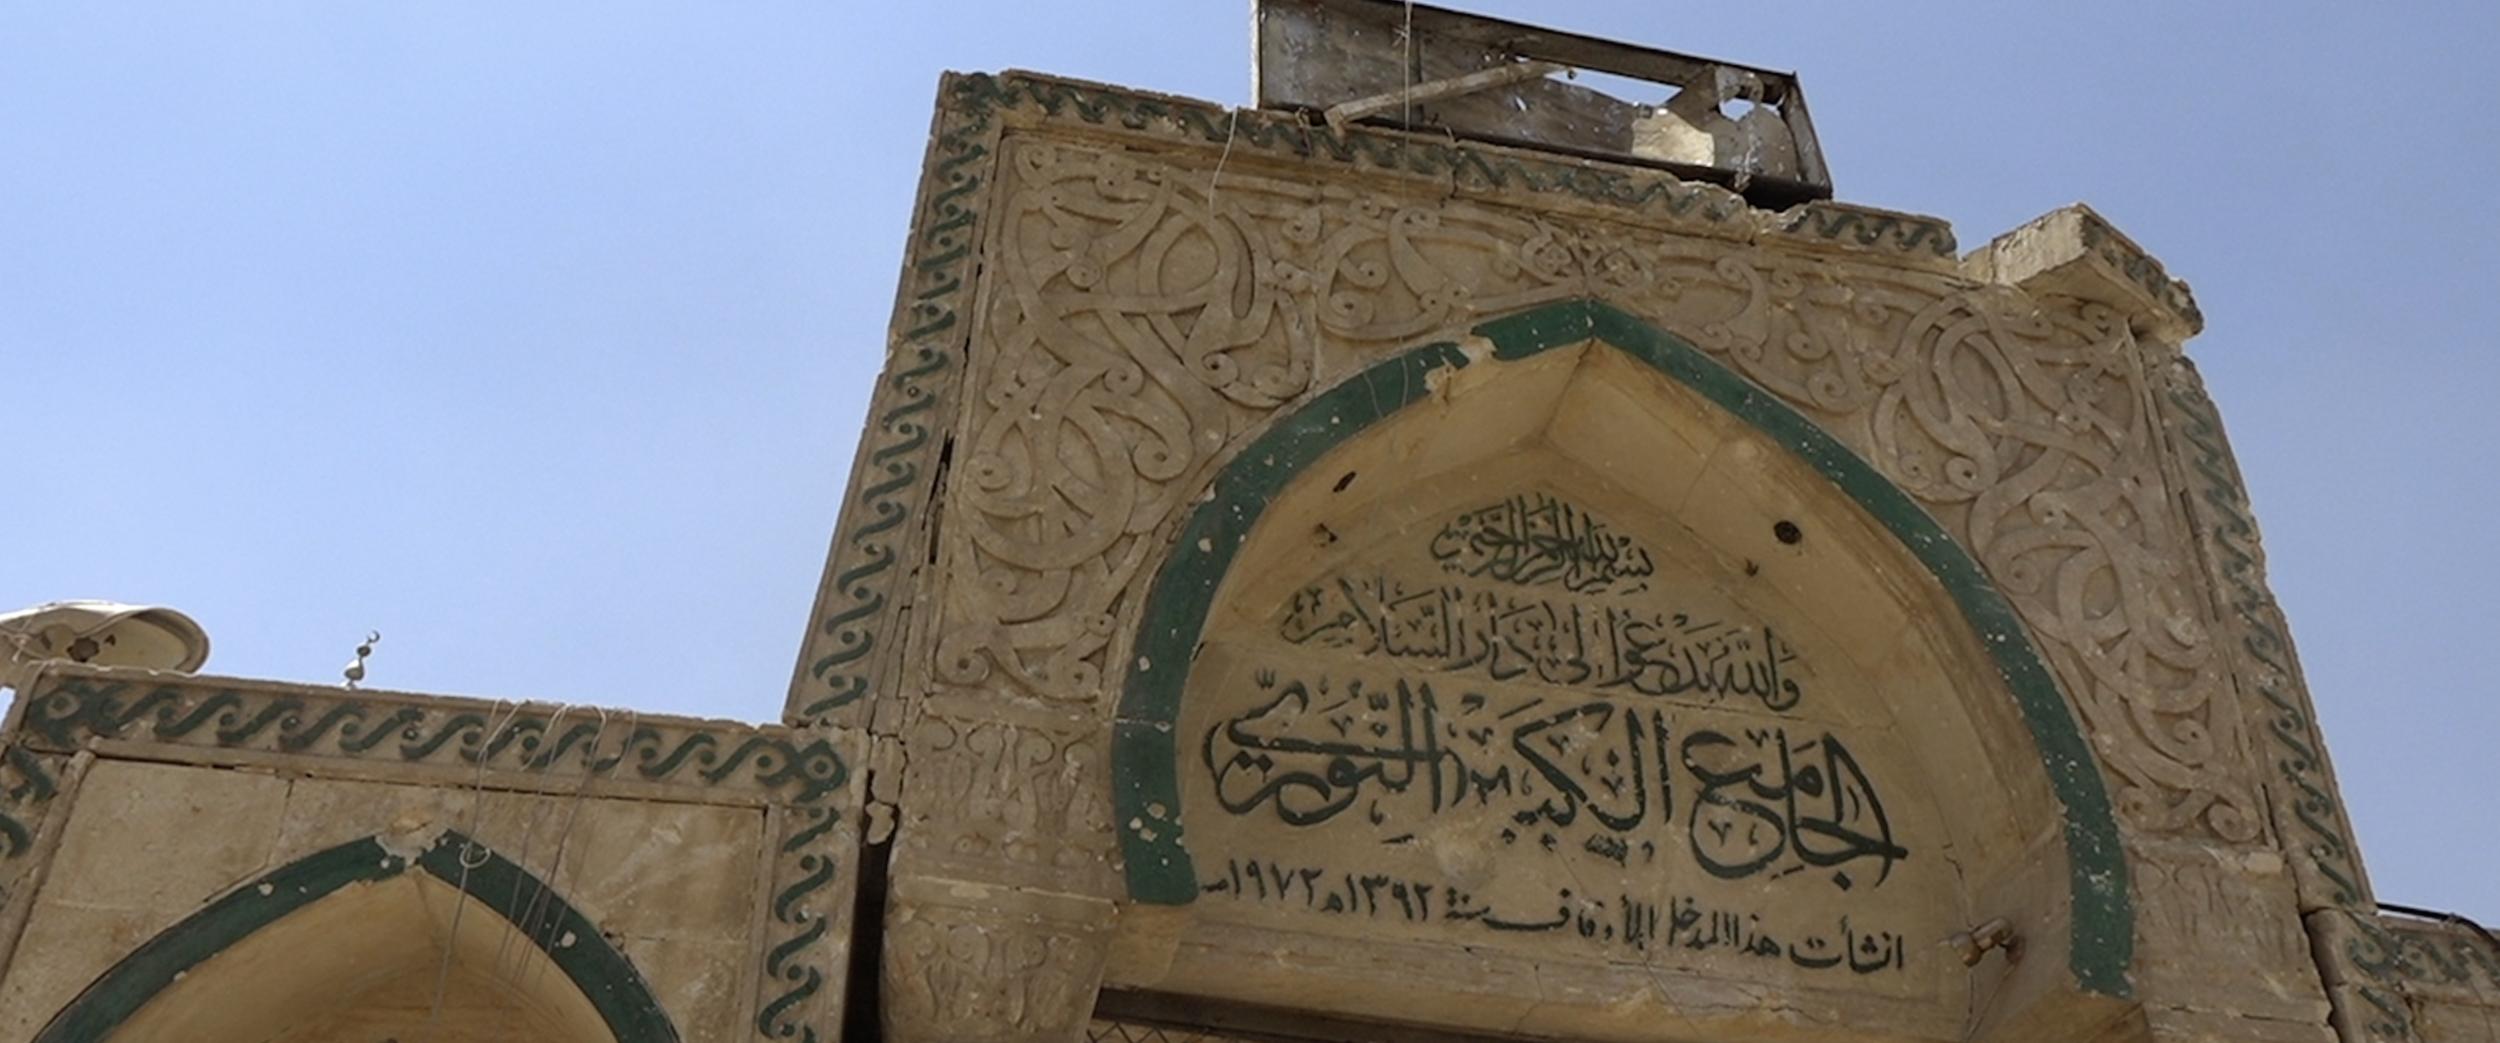 Al-Nuri mosque entrance inscription.png